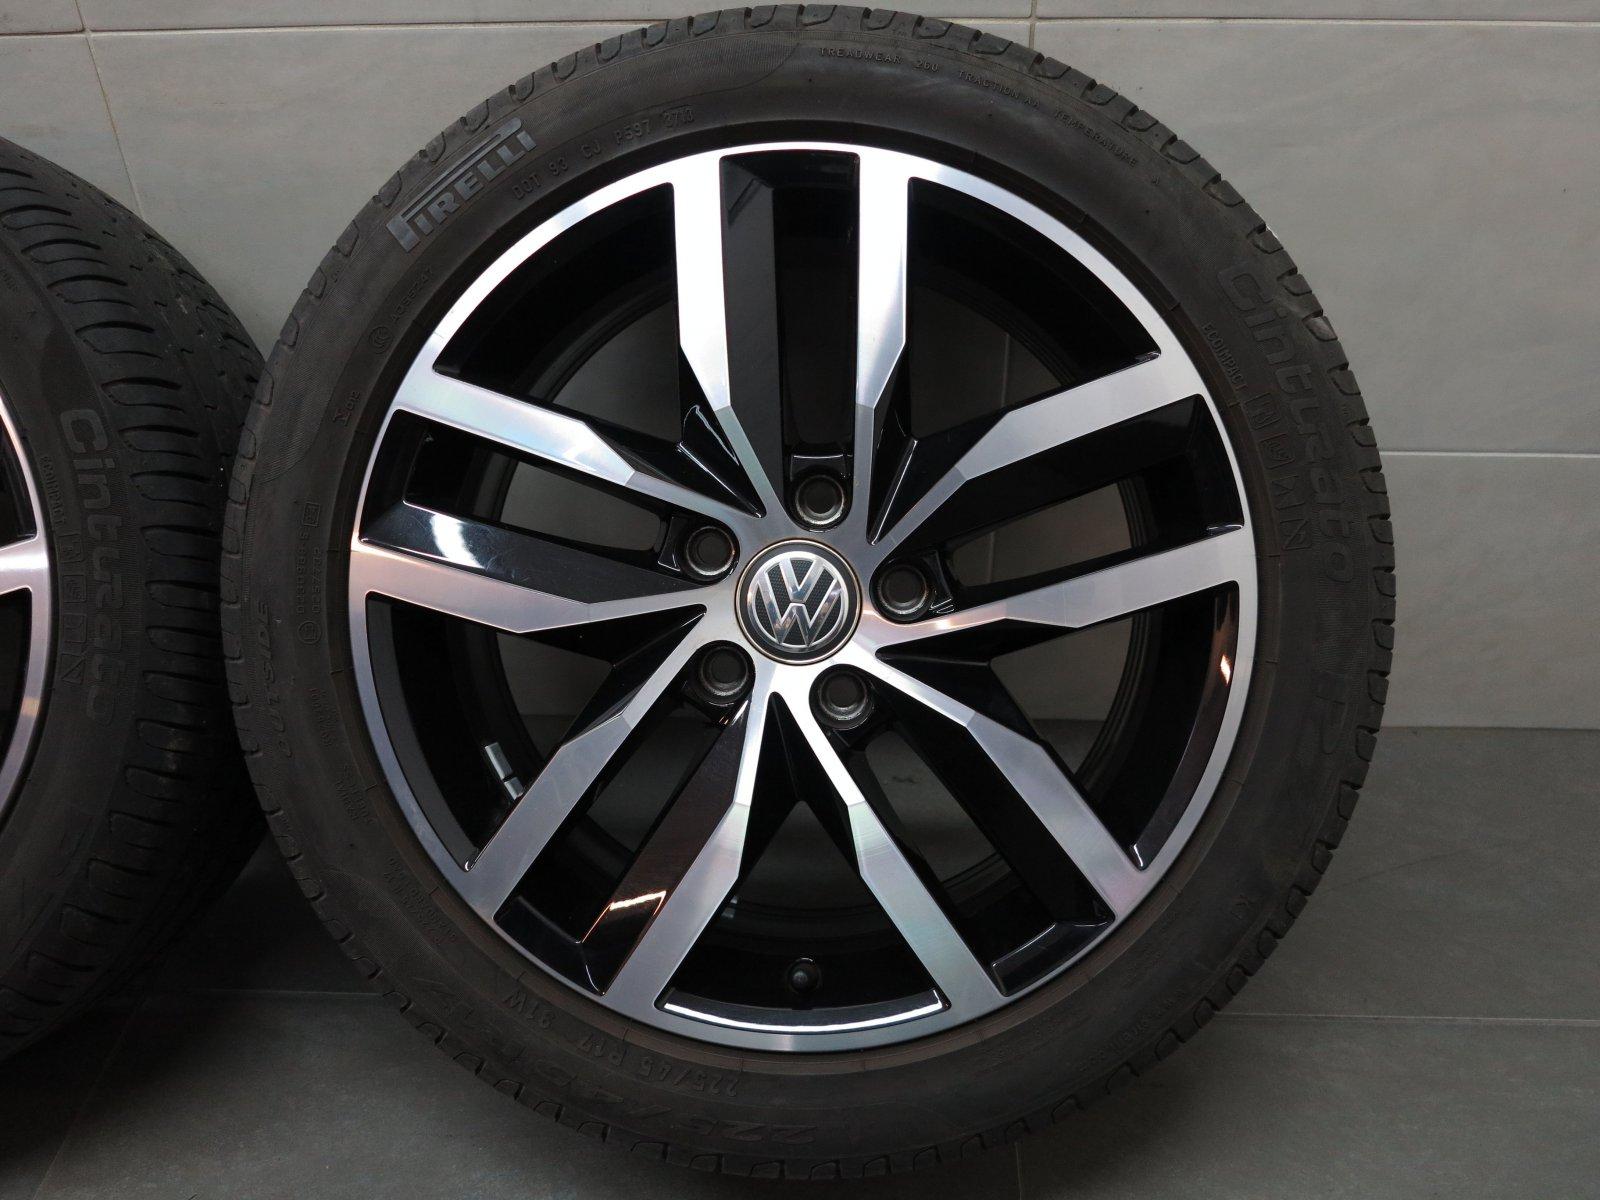 pneus d 39 t 17 pouces originales vw golf vii 5g madrid jante sportsvan ebay. Black Bedroom Furniture Sets. Home Design Ideas